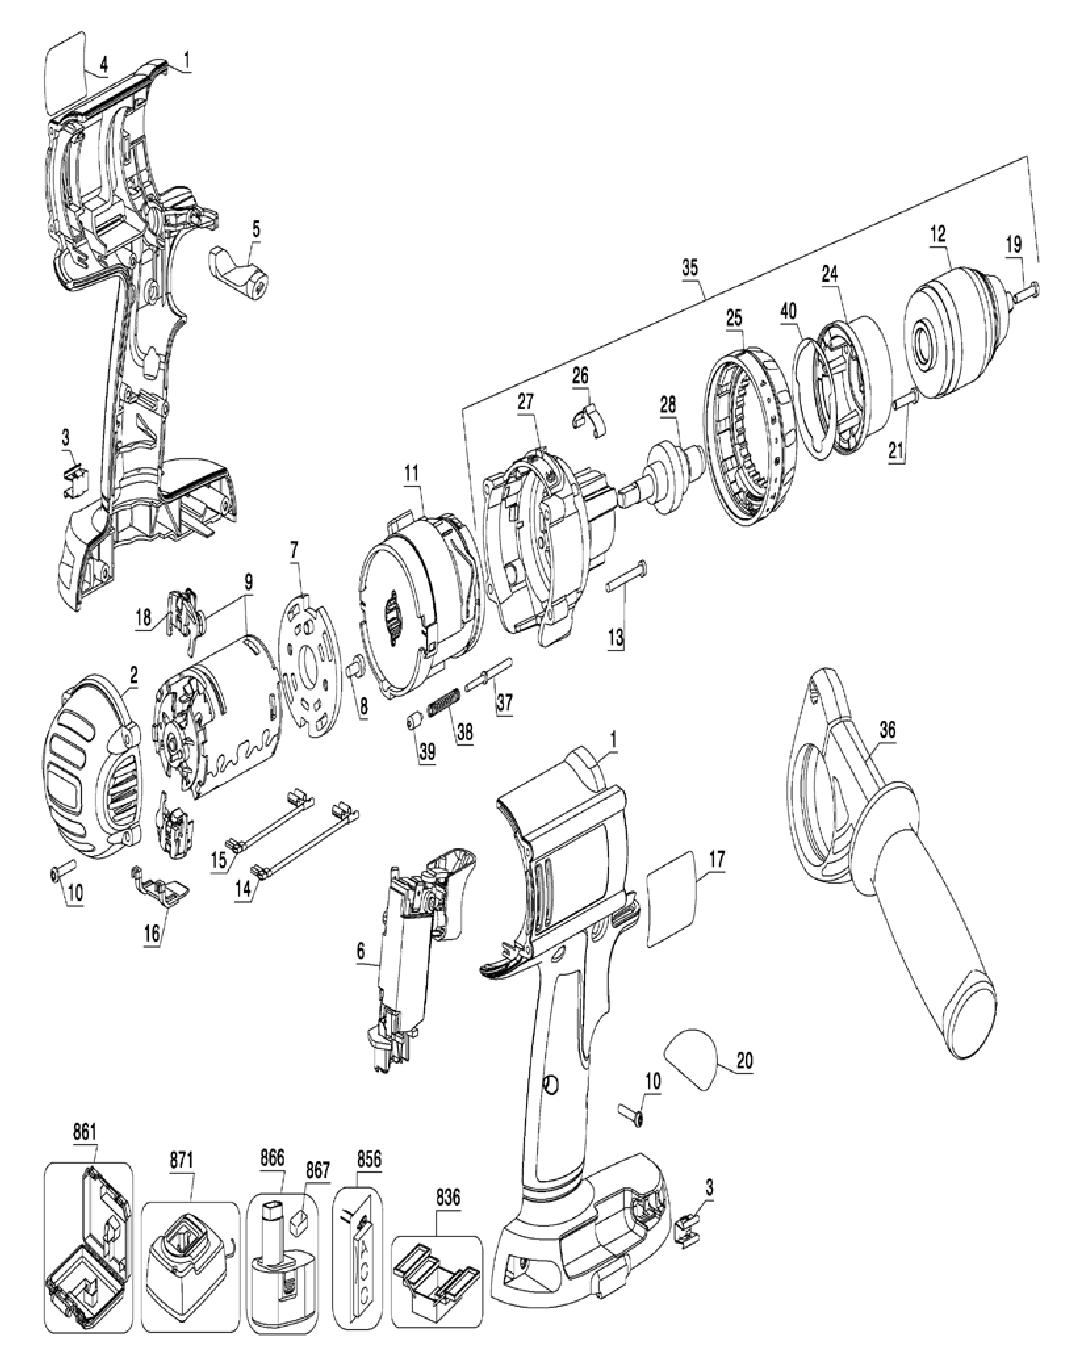 Buy Dewalt Dc920ka Heavy Duty 18v Xrp Replacement Tool